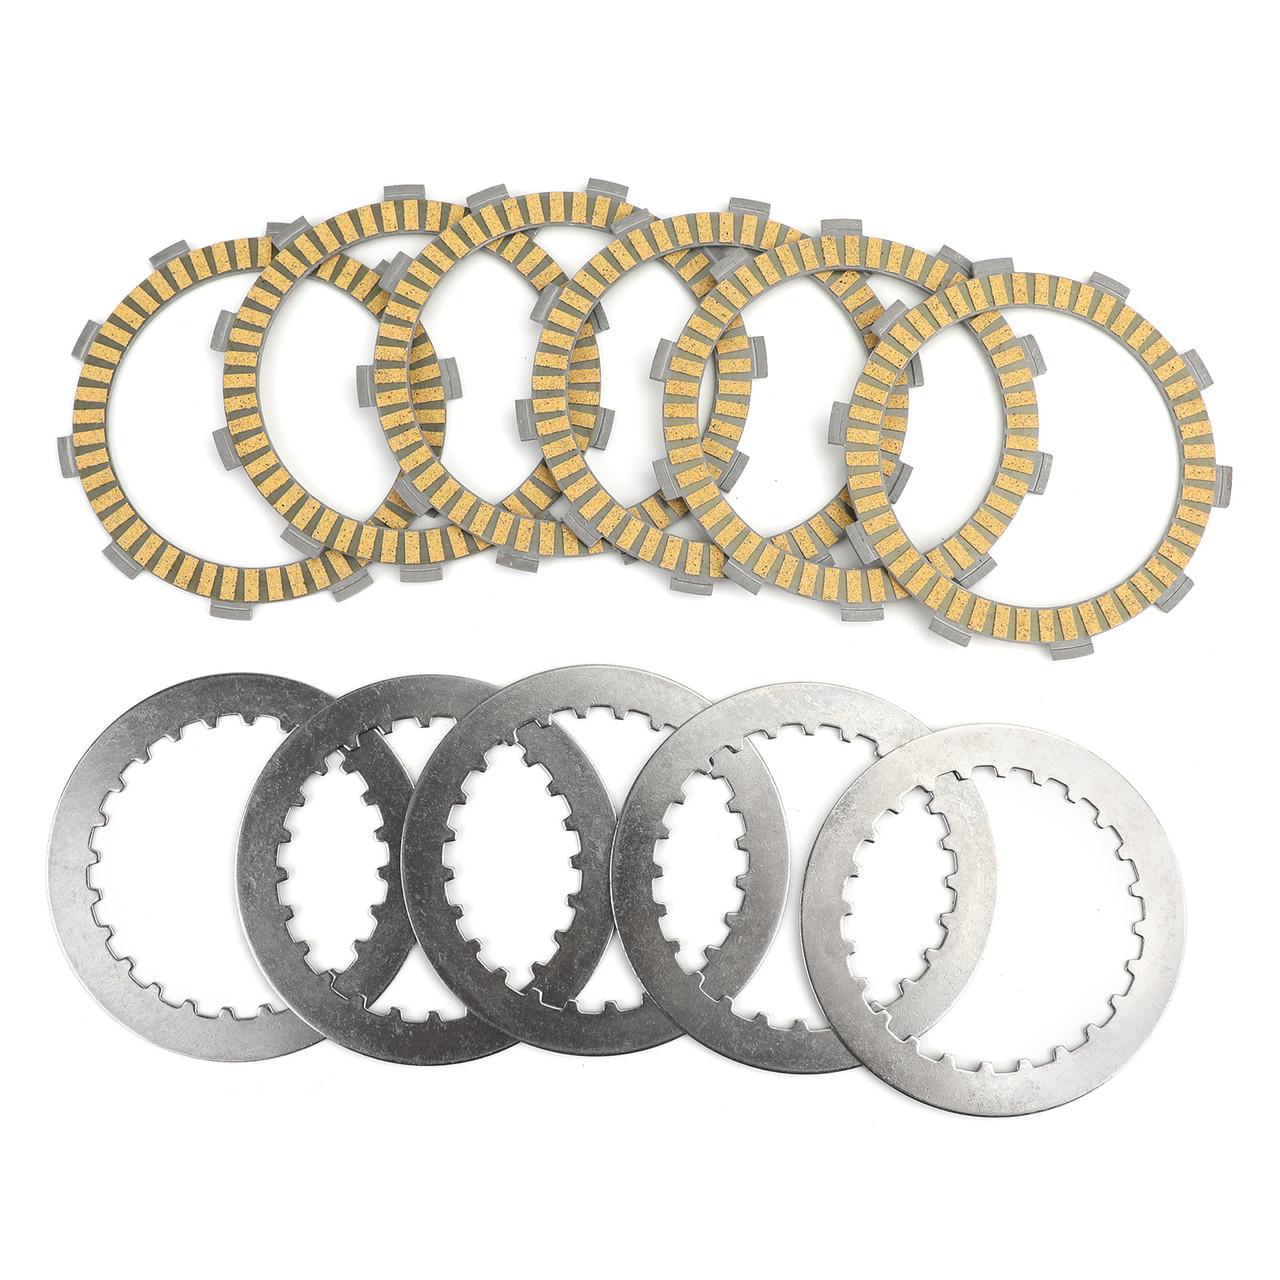 Clutch Plate Kit Fit For Honda CR125 RD/RE 83-84 NX250 2L/M/P/2P 90-93 XR250R 86-04 XR250 Y/3 (MD30) 00-03 CBF250 04-06